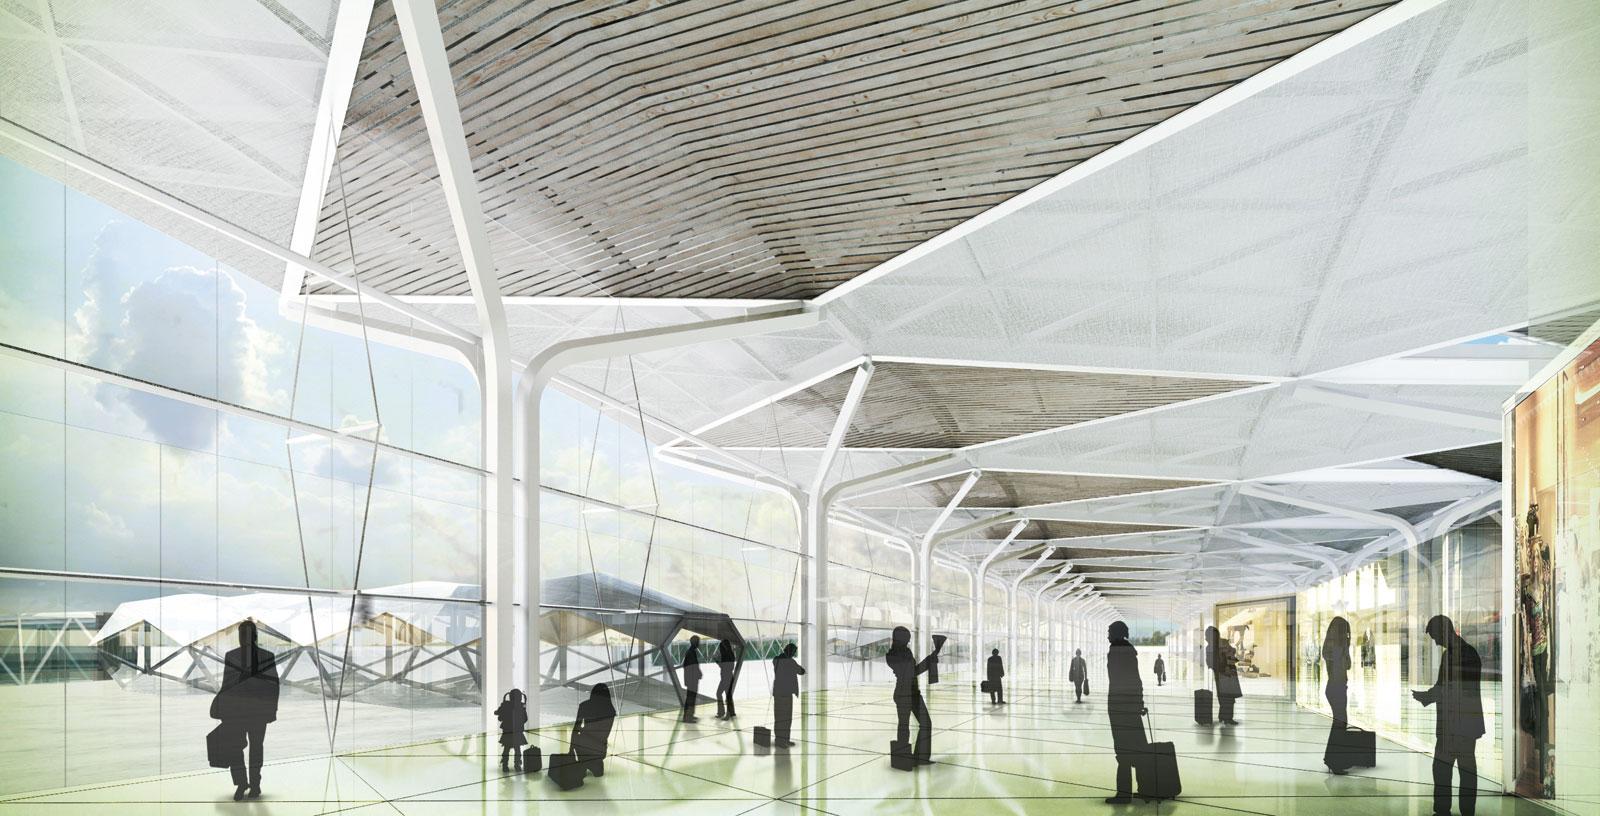 Natal-Airport_01_Architecture_IDOM_computer-graphics-Ismael-Vega_Andreia-Faley